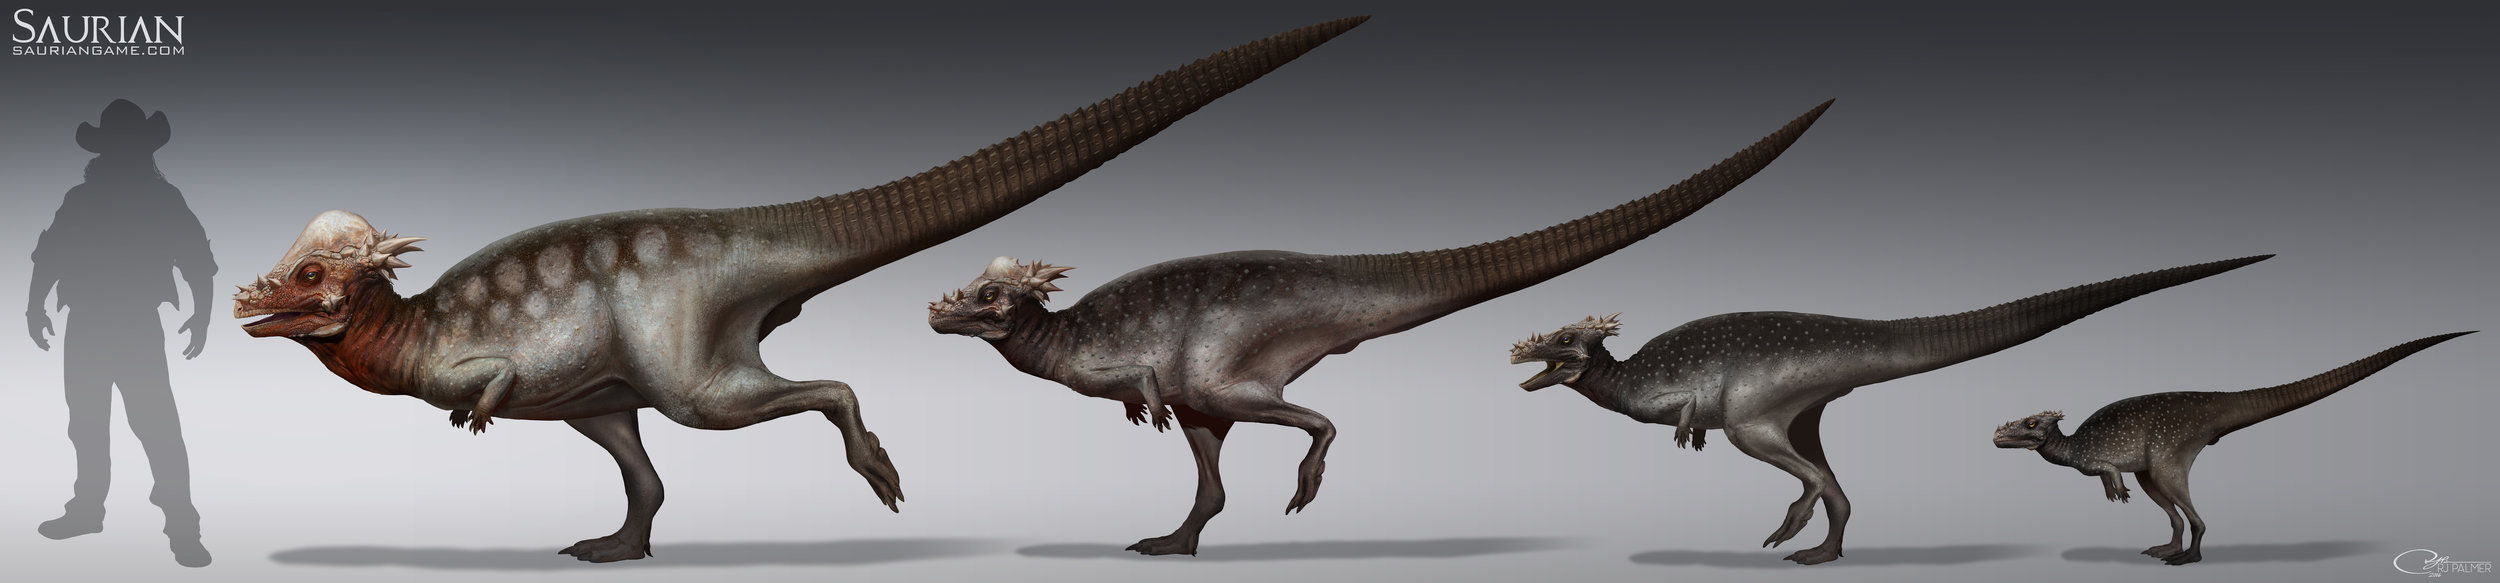 Pachycephalosaurus Ontogeny